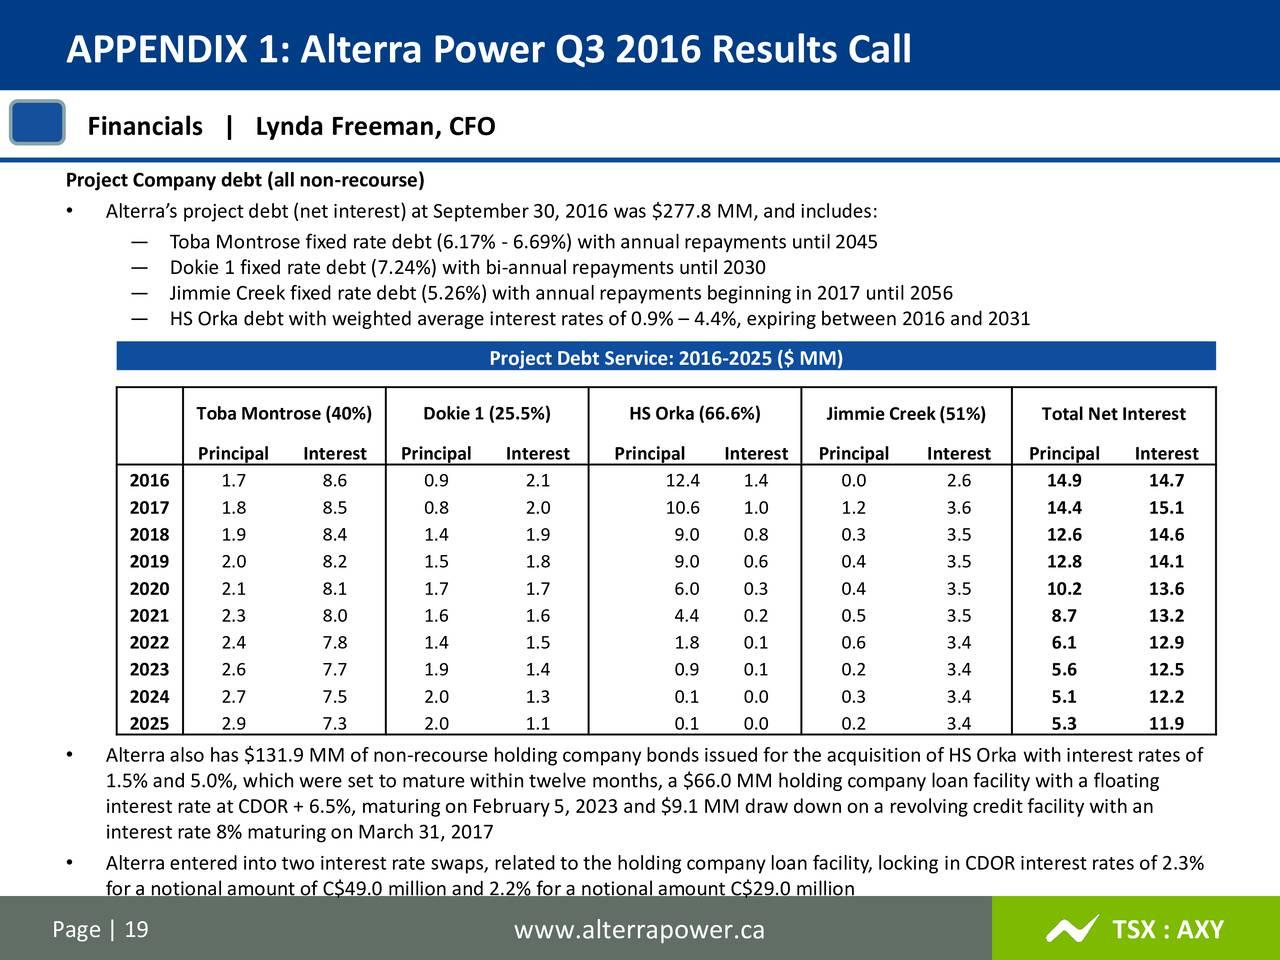 Alterra Power Corp. 2016 Q3